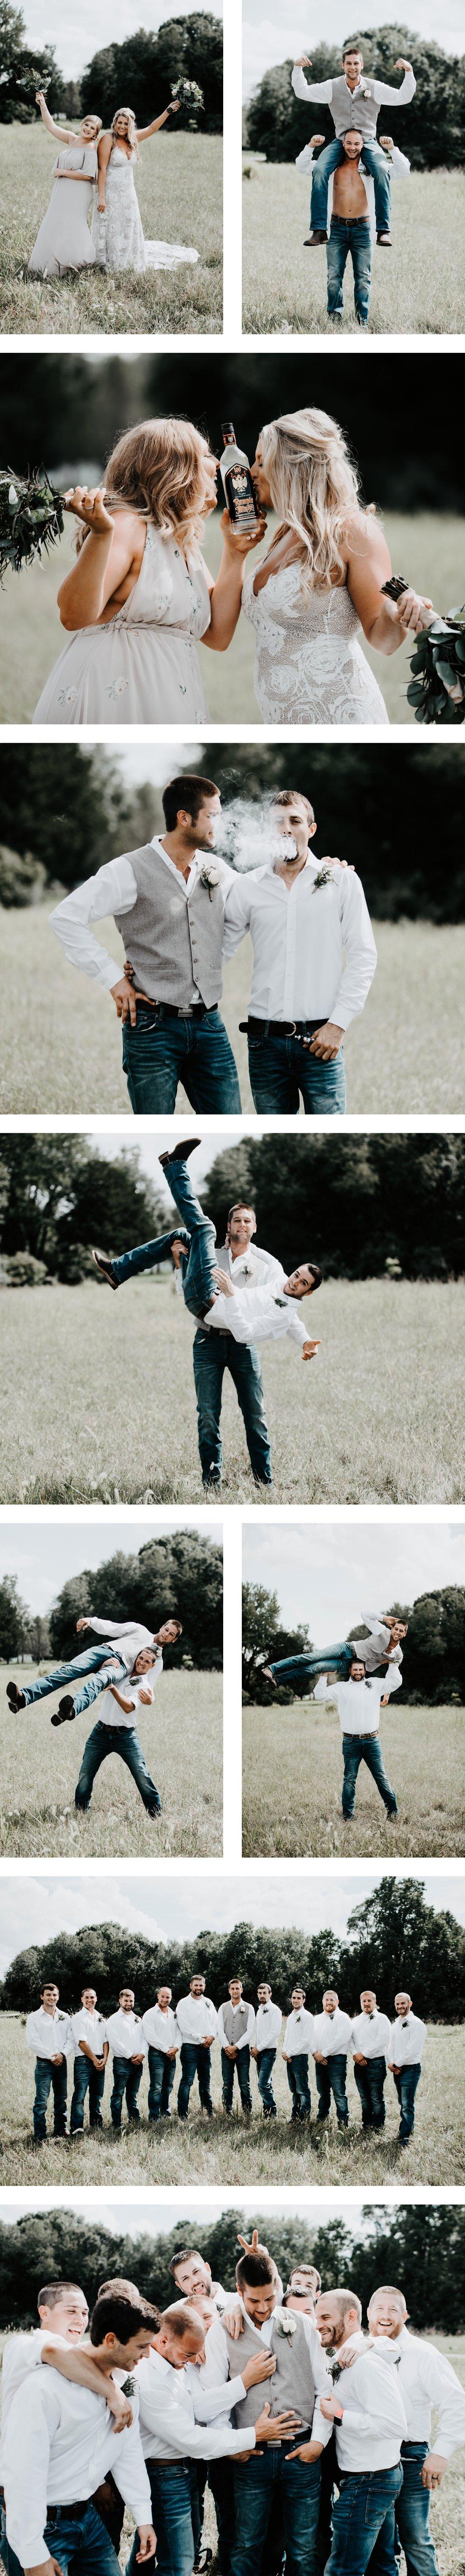 The Pudik Wedding 8.jpg